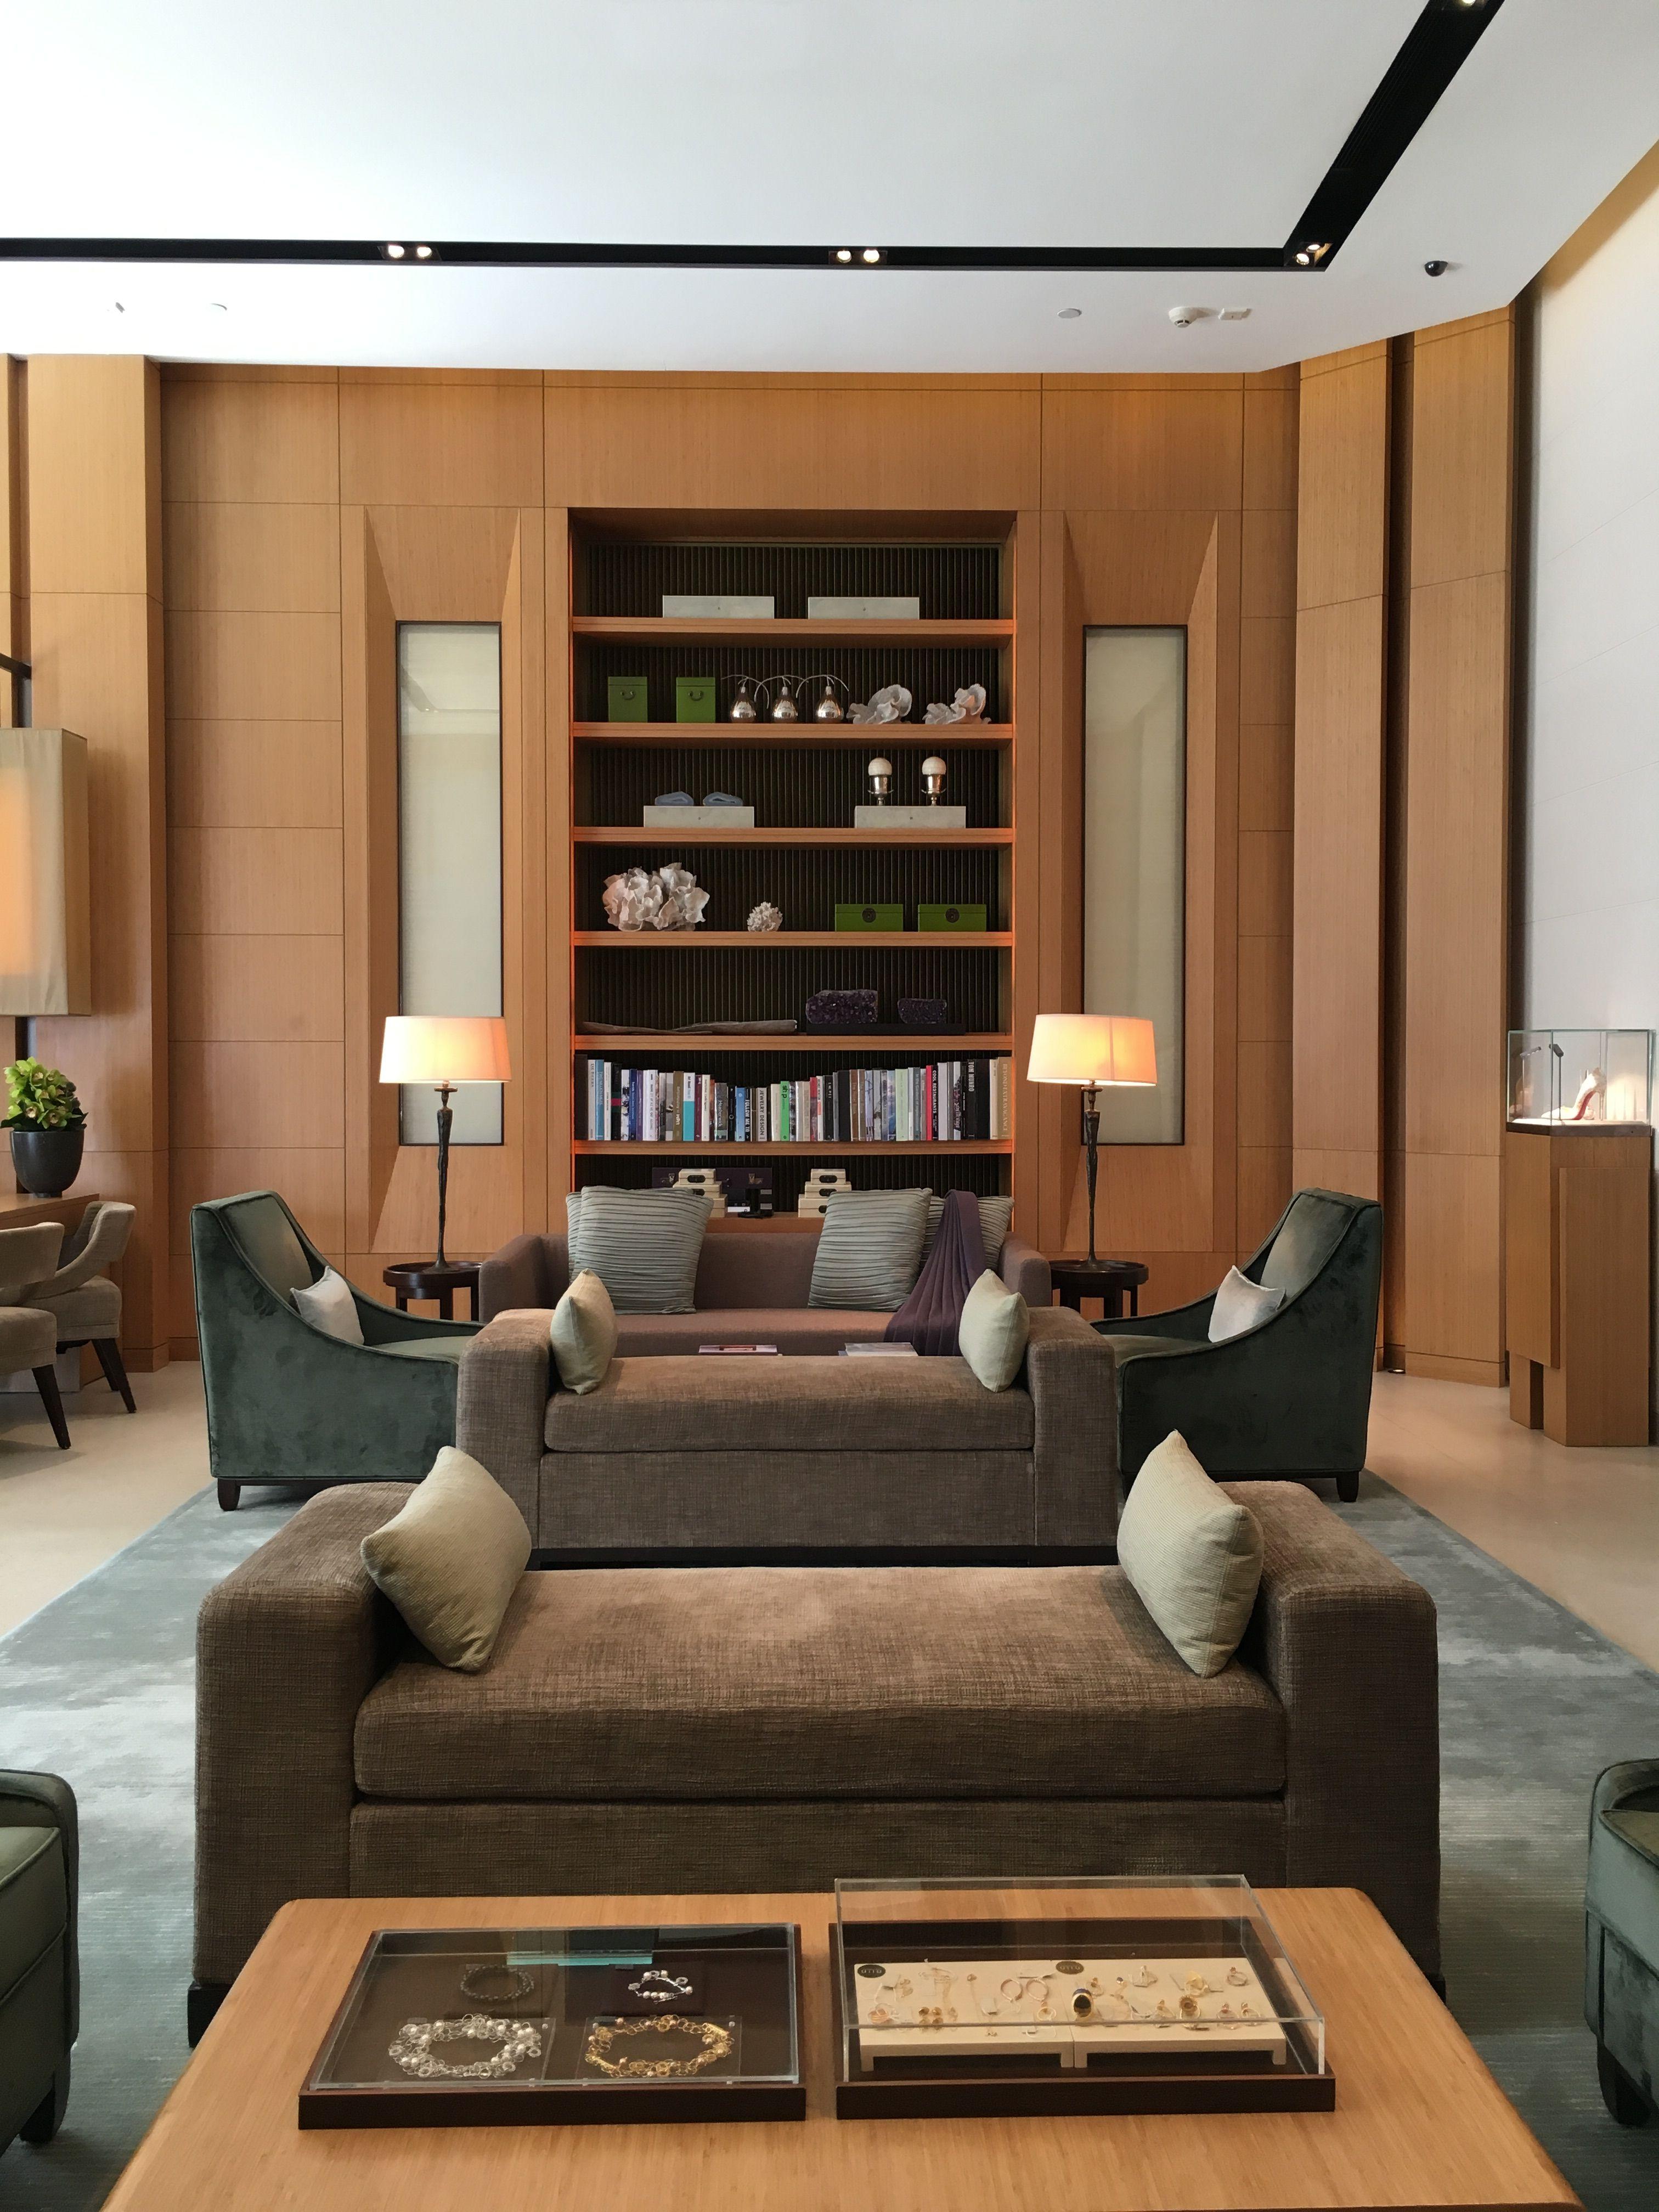 Upper House, Hong Kong, For MR PORTER Style Council. Http://mr-p.co/0lZQ0X